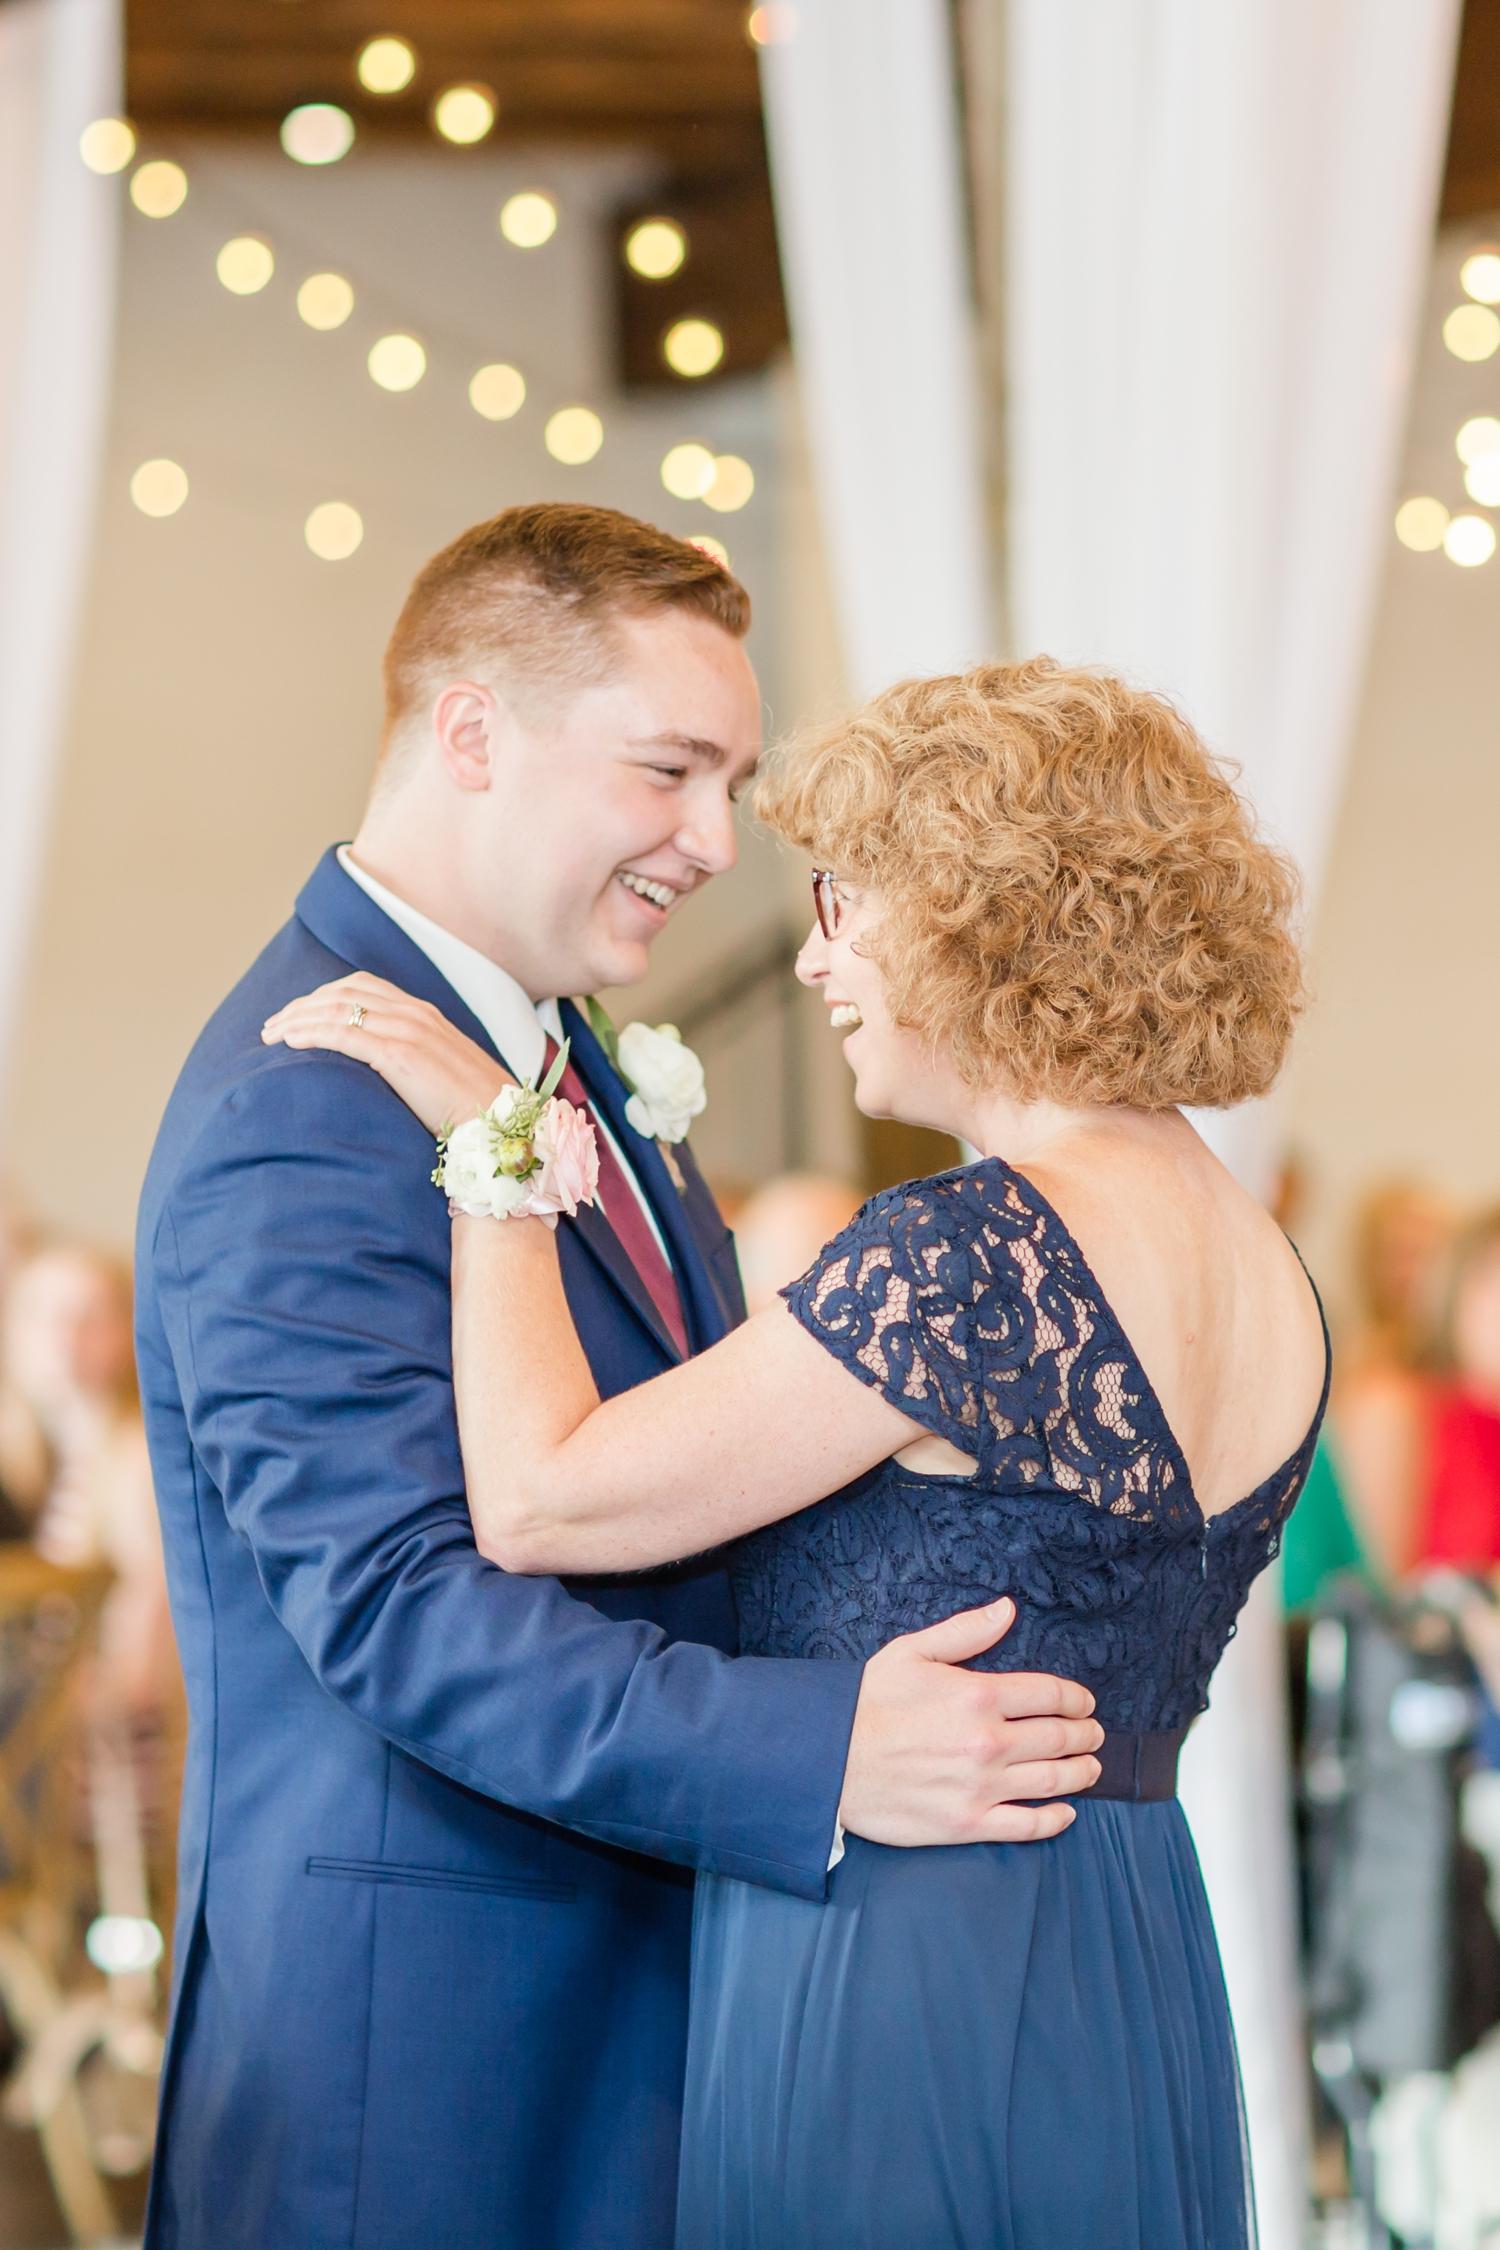 ADKINS WEDDING HIGHLIGHTS-286_The-Granary-wedding-Valley-Pike-Farm-Market-Virginia-wedding-photographer-anna-grace-photography-photo.jpg